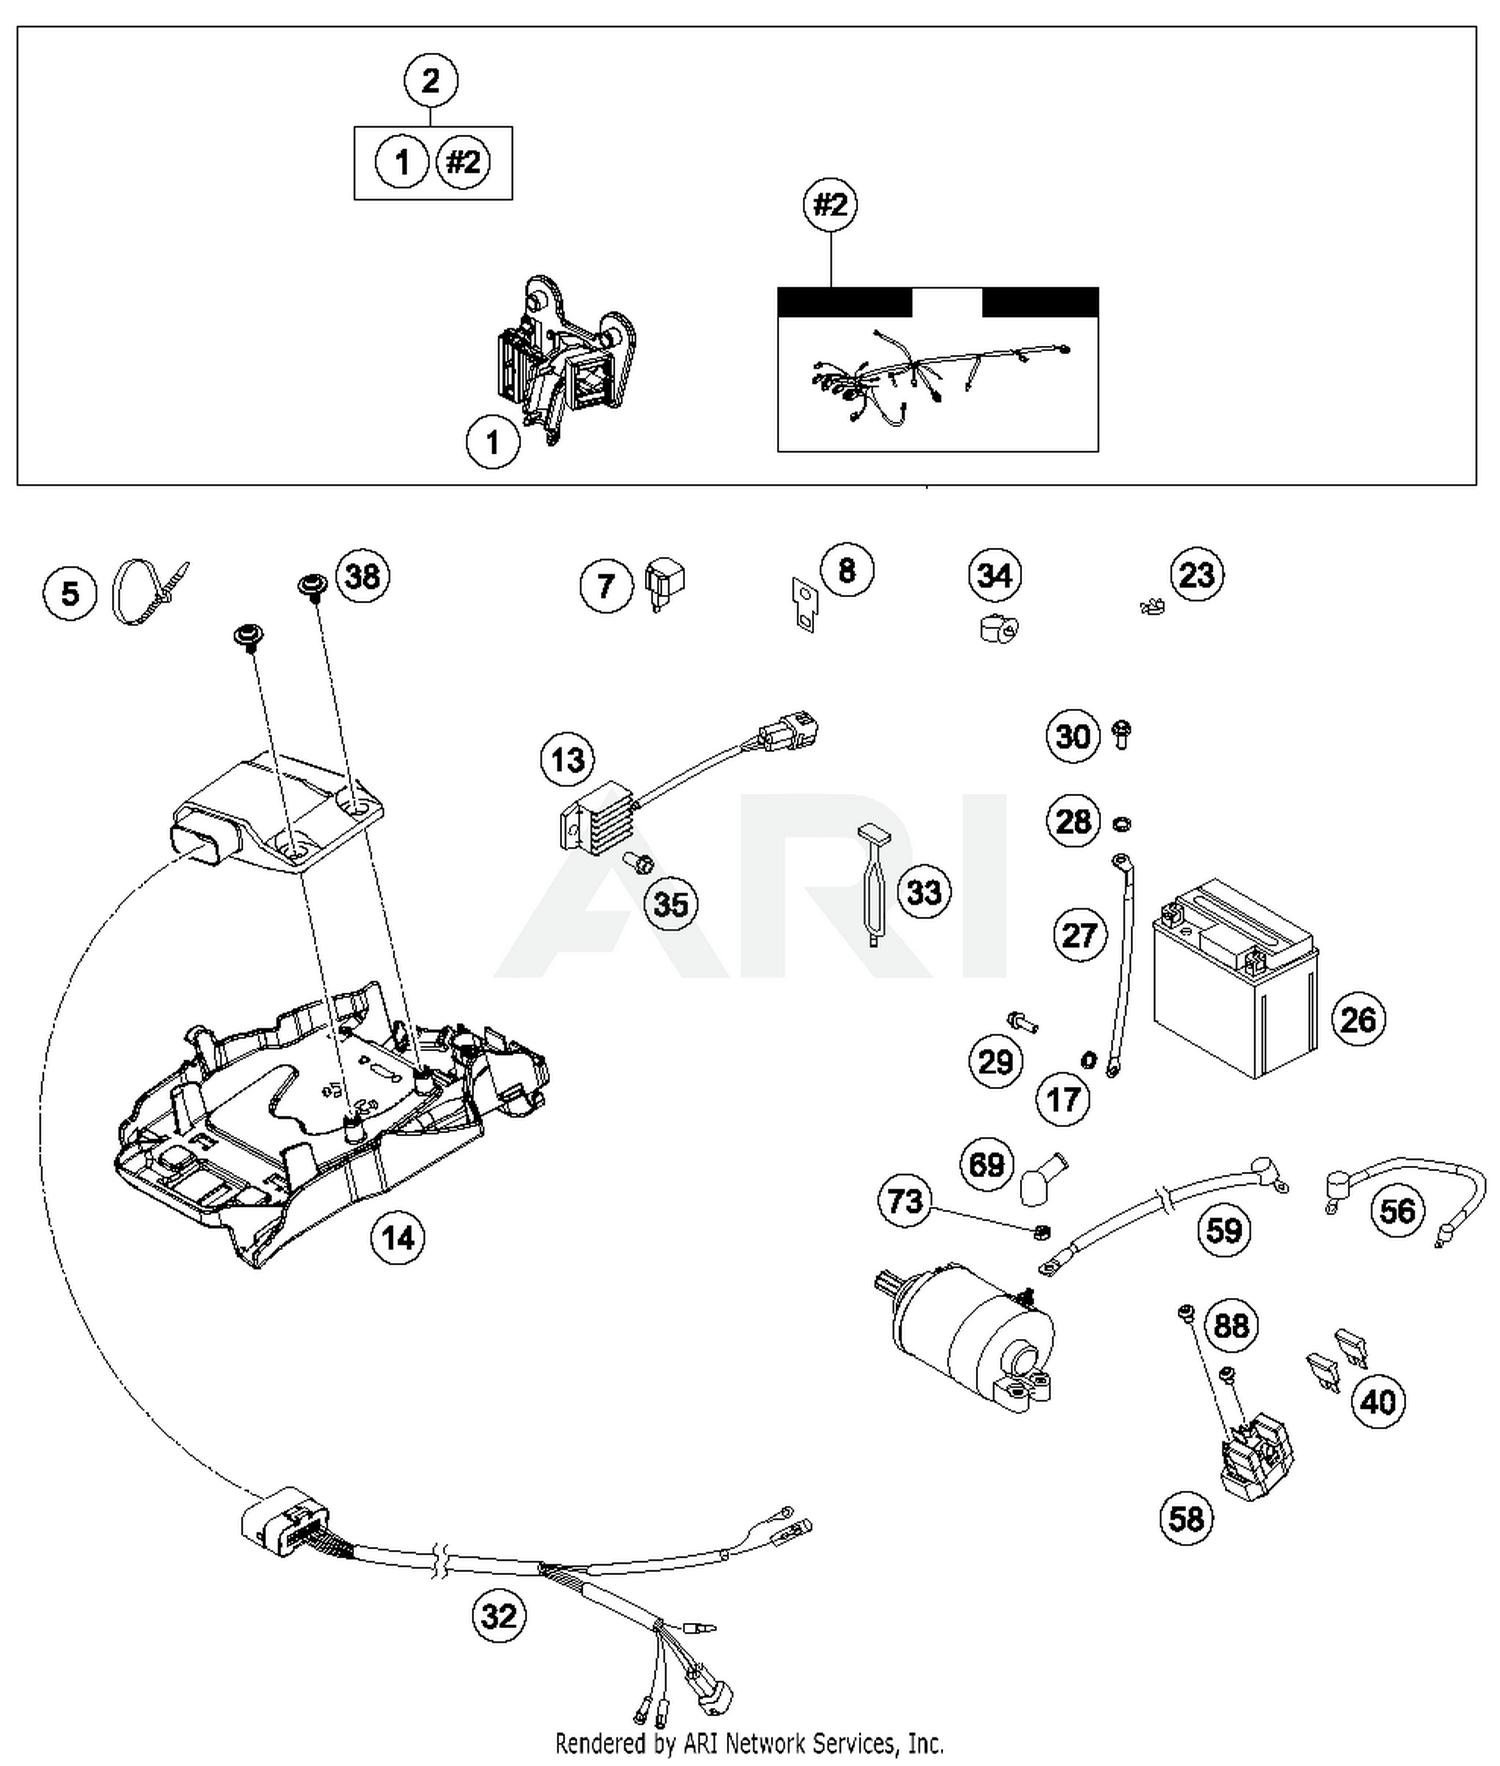 Husqvarna Wiring Harness | Online Wiring Diagram on polaris wiring diagram, riding lawn mower wiring diagram, bajaj wiring diagram, sears wiring diagram, husqvarna mower schematics, cub cadet wiring diagram, kubota wiring diagram, arctic cat wiring diagram, husqvarna honda, norton wiring diagram, beta wiring diagram, scotts wiring diagram, ossa wiring diagram, yamaha wiring diagram, echo wiring diagram, electrolux wiring diagram, ajs wiring diagram, husky riding mower parts diagram, simplicity wiring diagram, ayp wiring diagram,